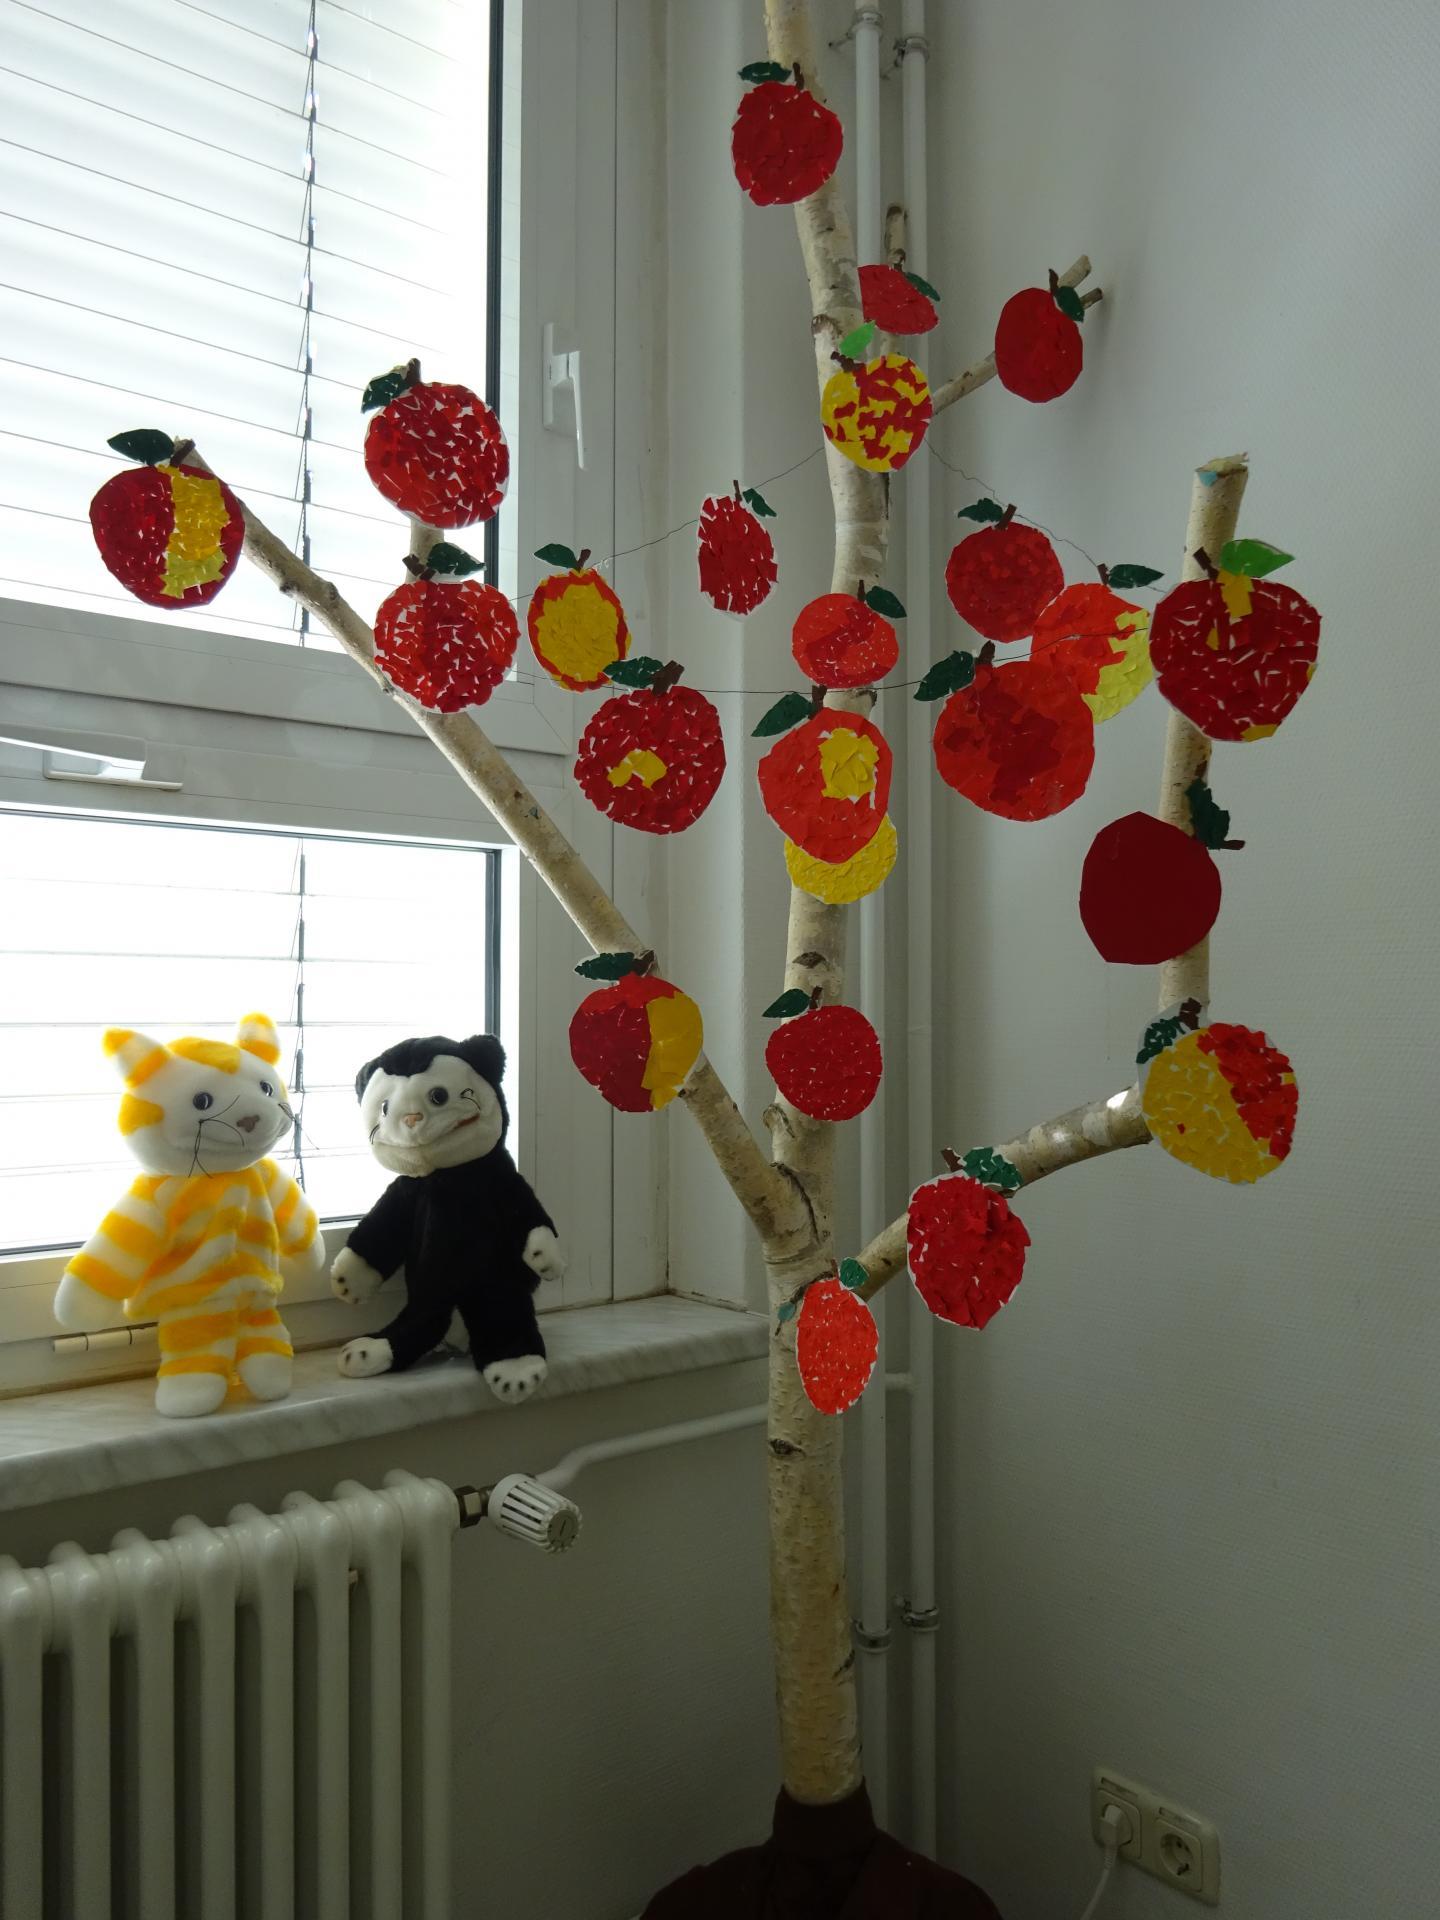 Friedrich Ludwig Jahn Grundschule Luckenwalde Klasse 1a So Viele Leckere Apfel